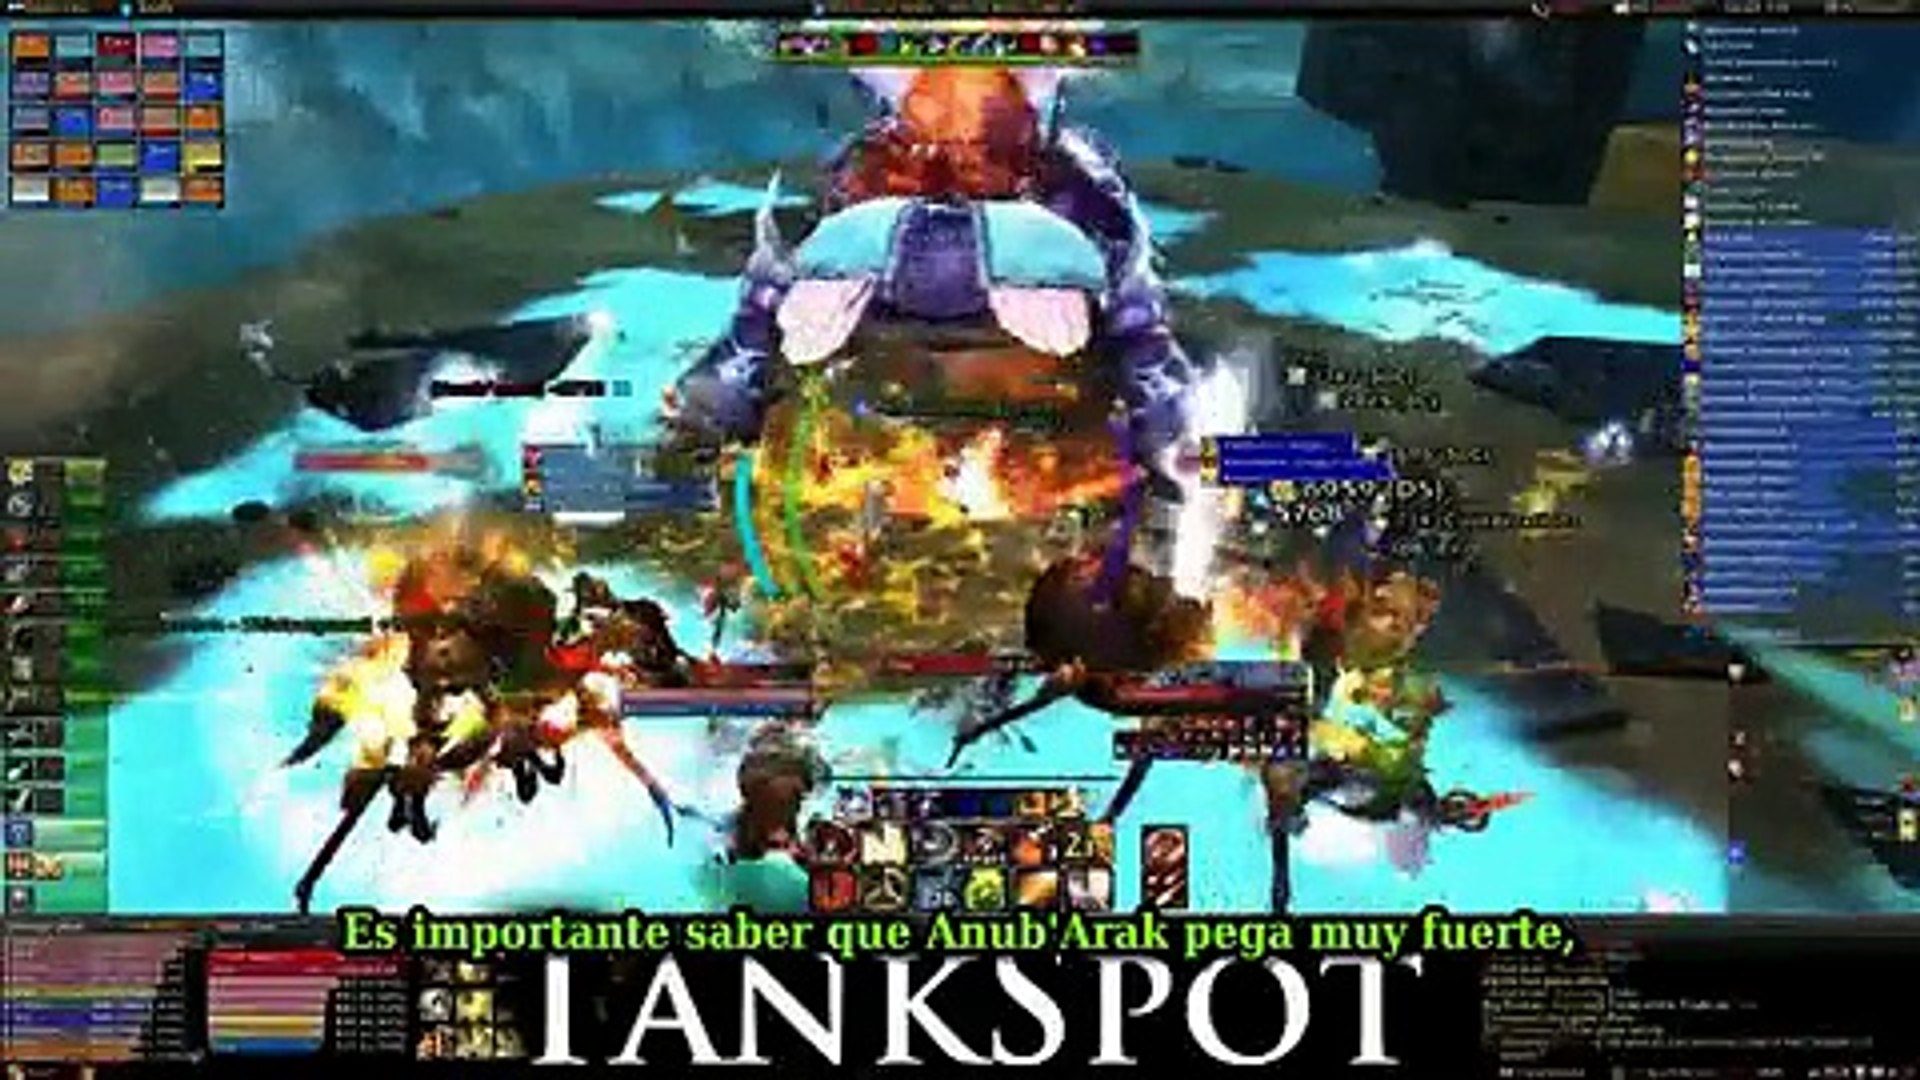 Guia Anubarak Tutorial 335 World Of Warcraft Prueba Del Cruzado